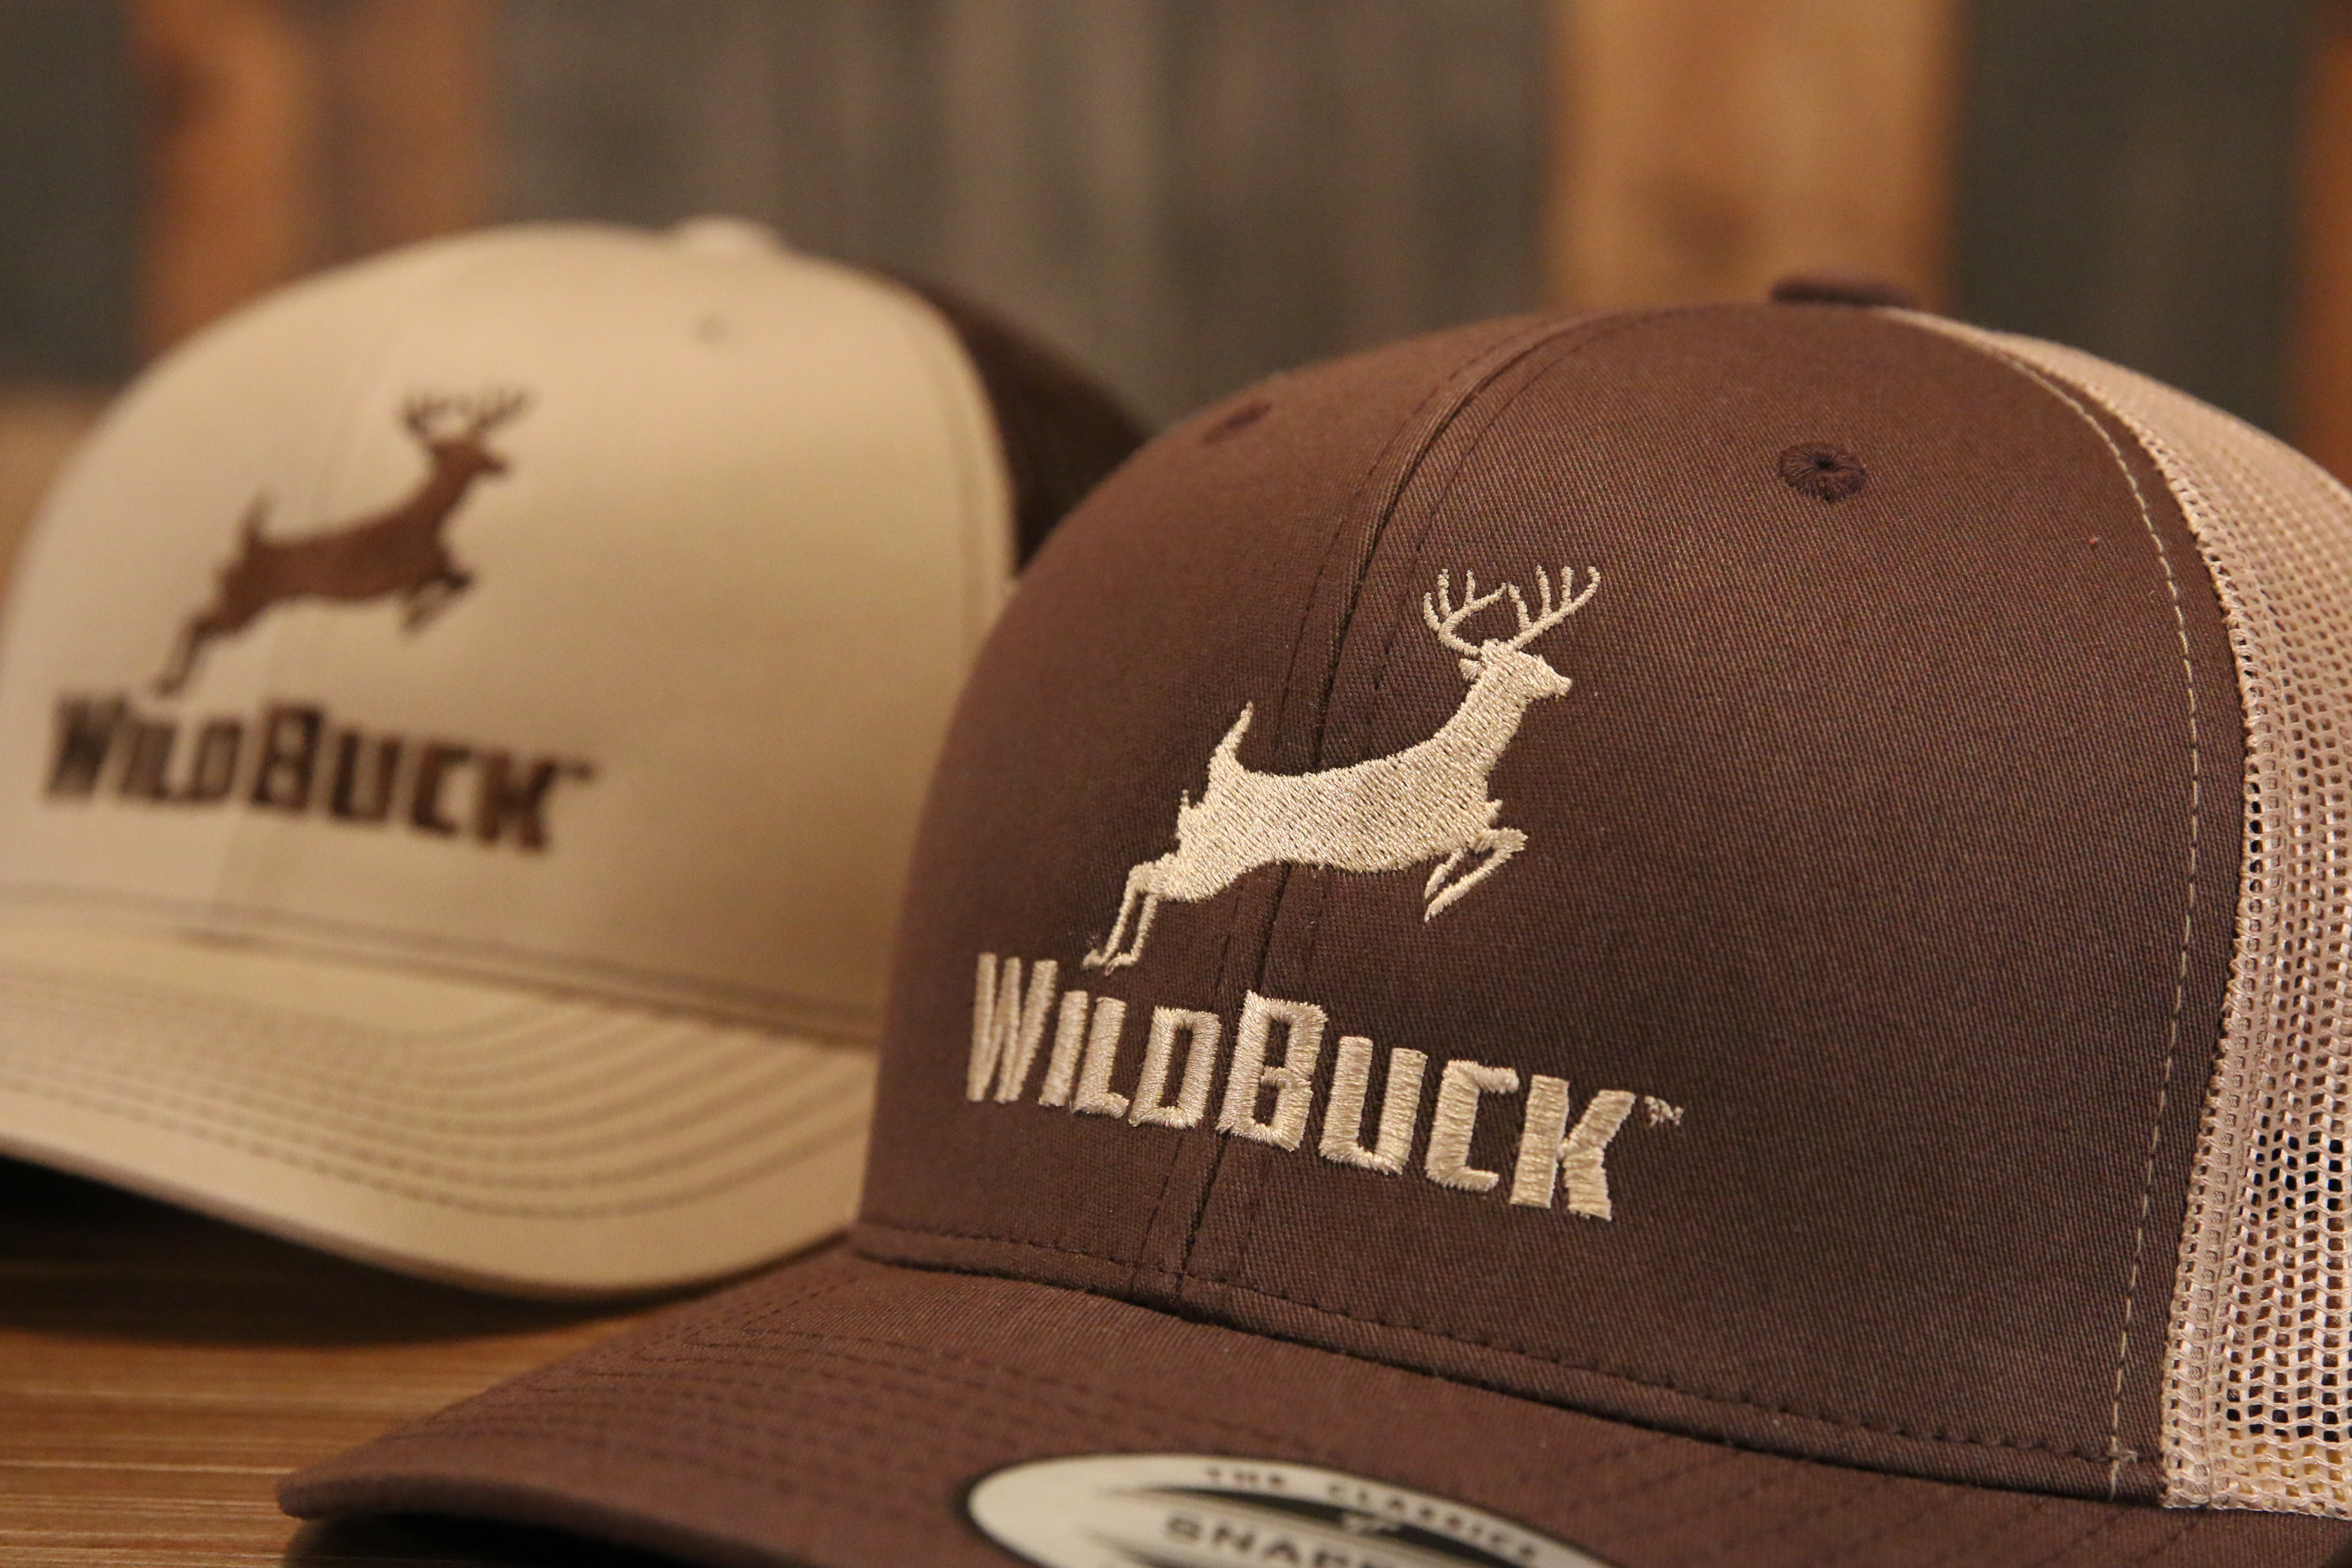 WildBuck Original Chocolate Antler and Buckskin Hats